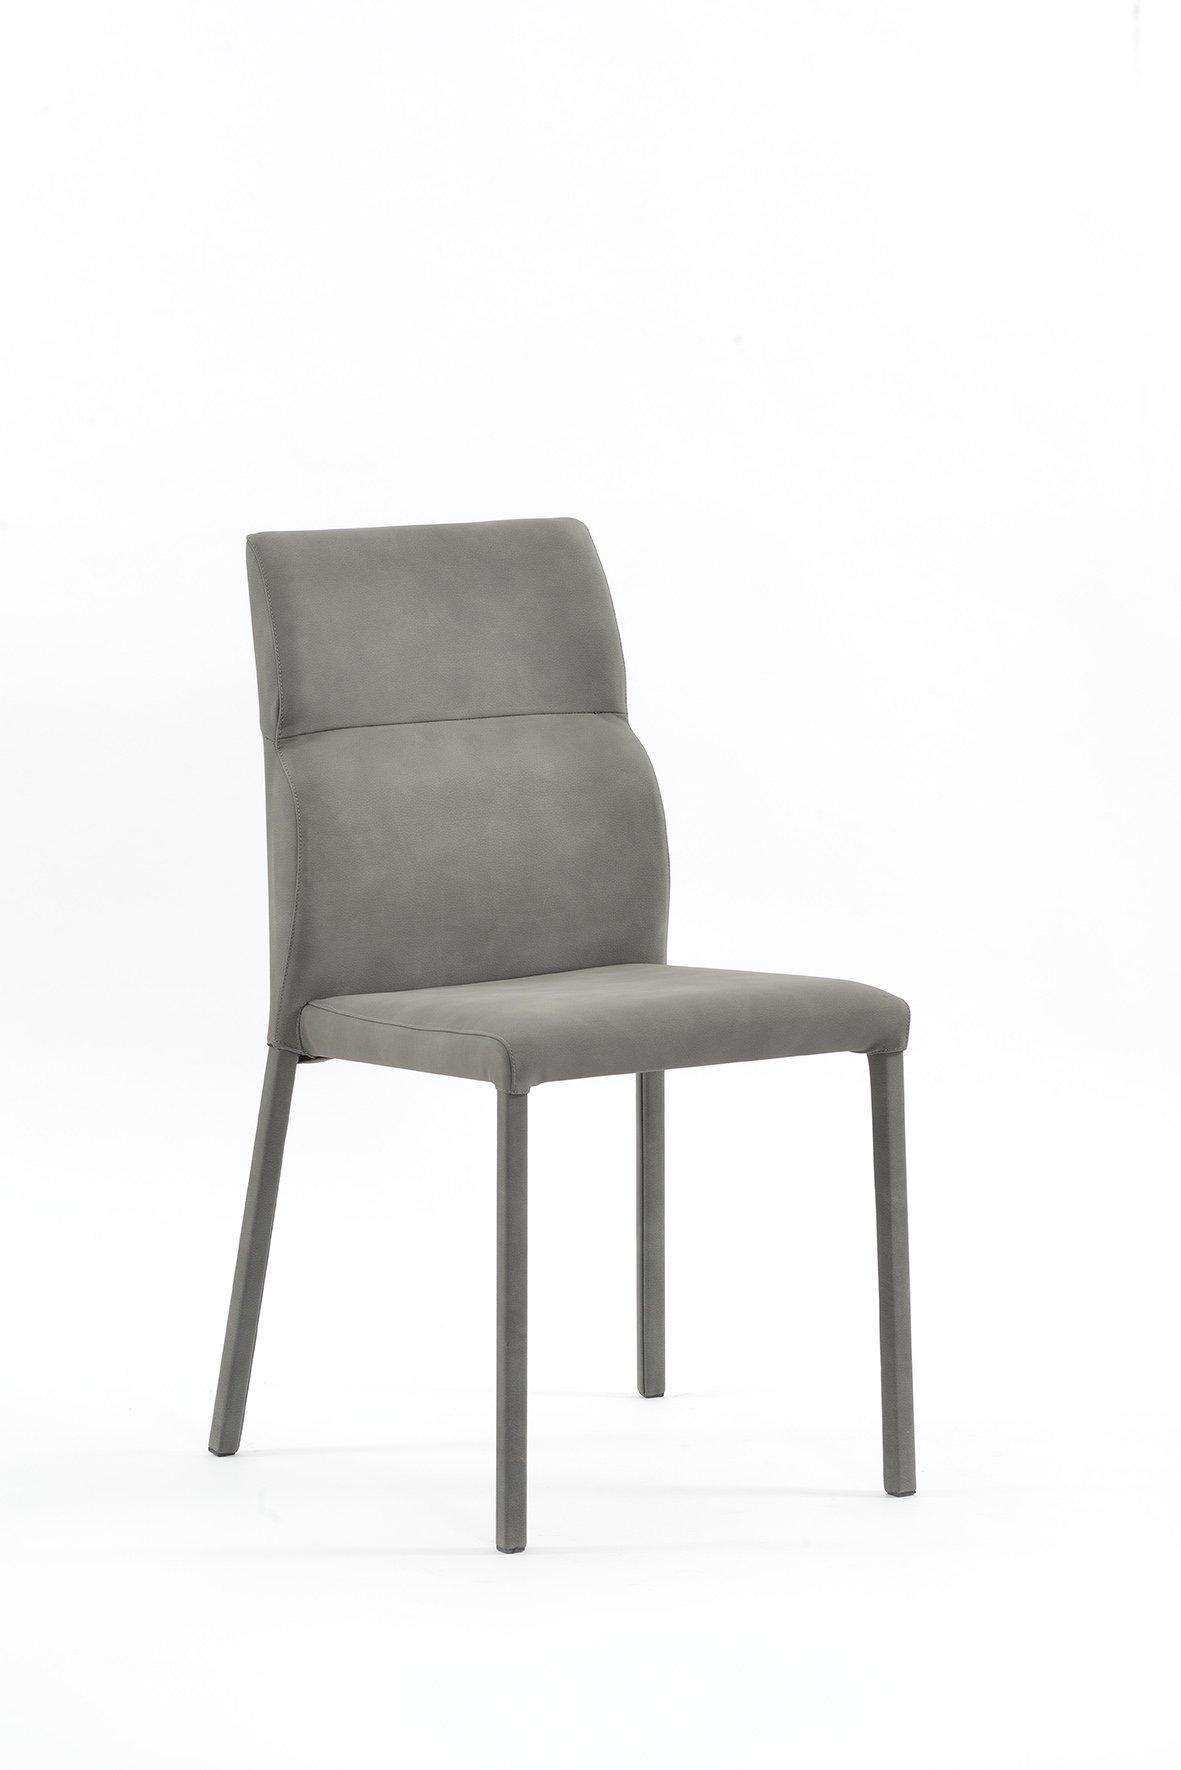 produzione sedie e sgabelli treviso pizetaci design On sedie design treviso